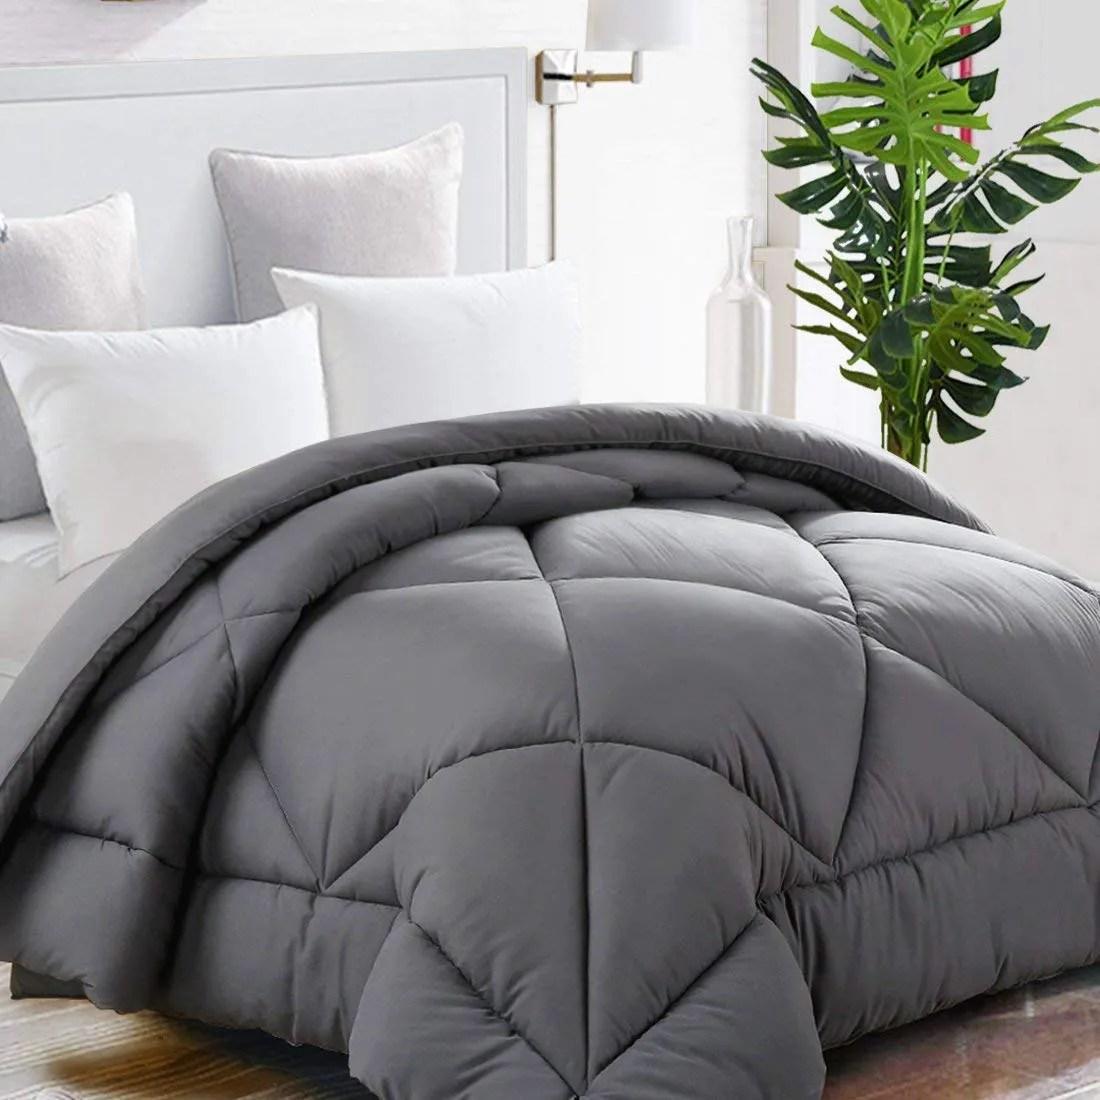 tekamon all season down alternative comforter